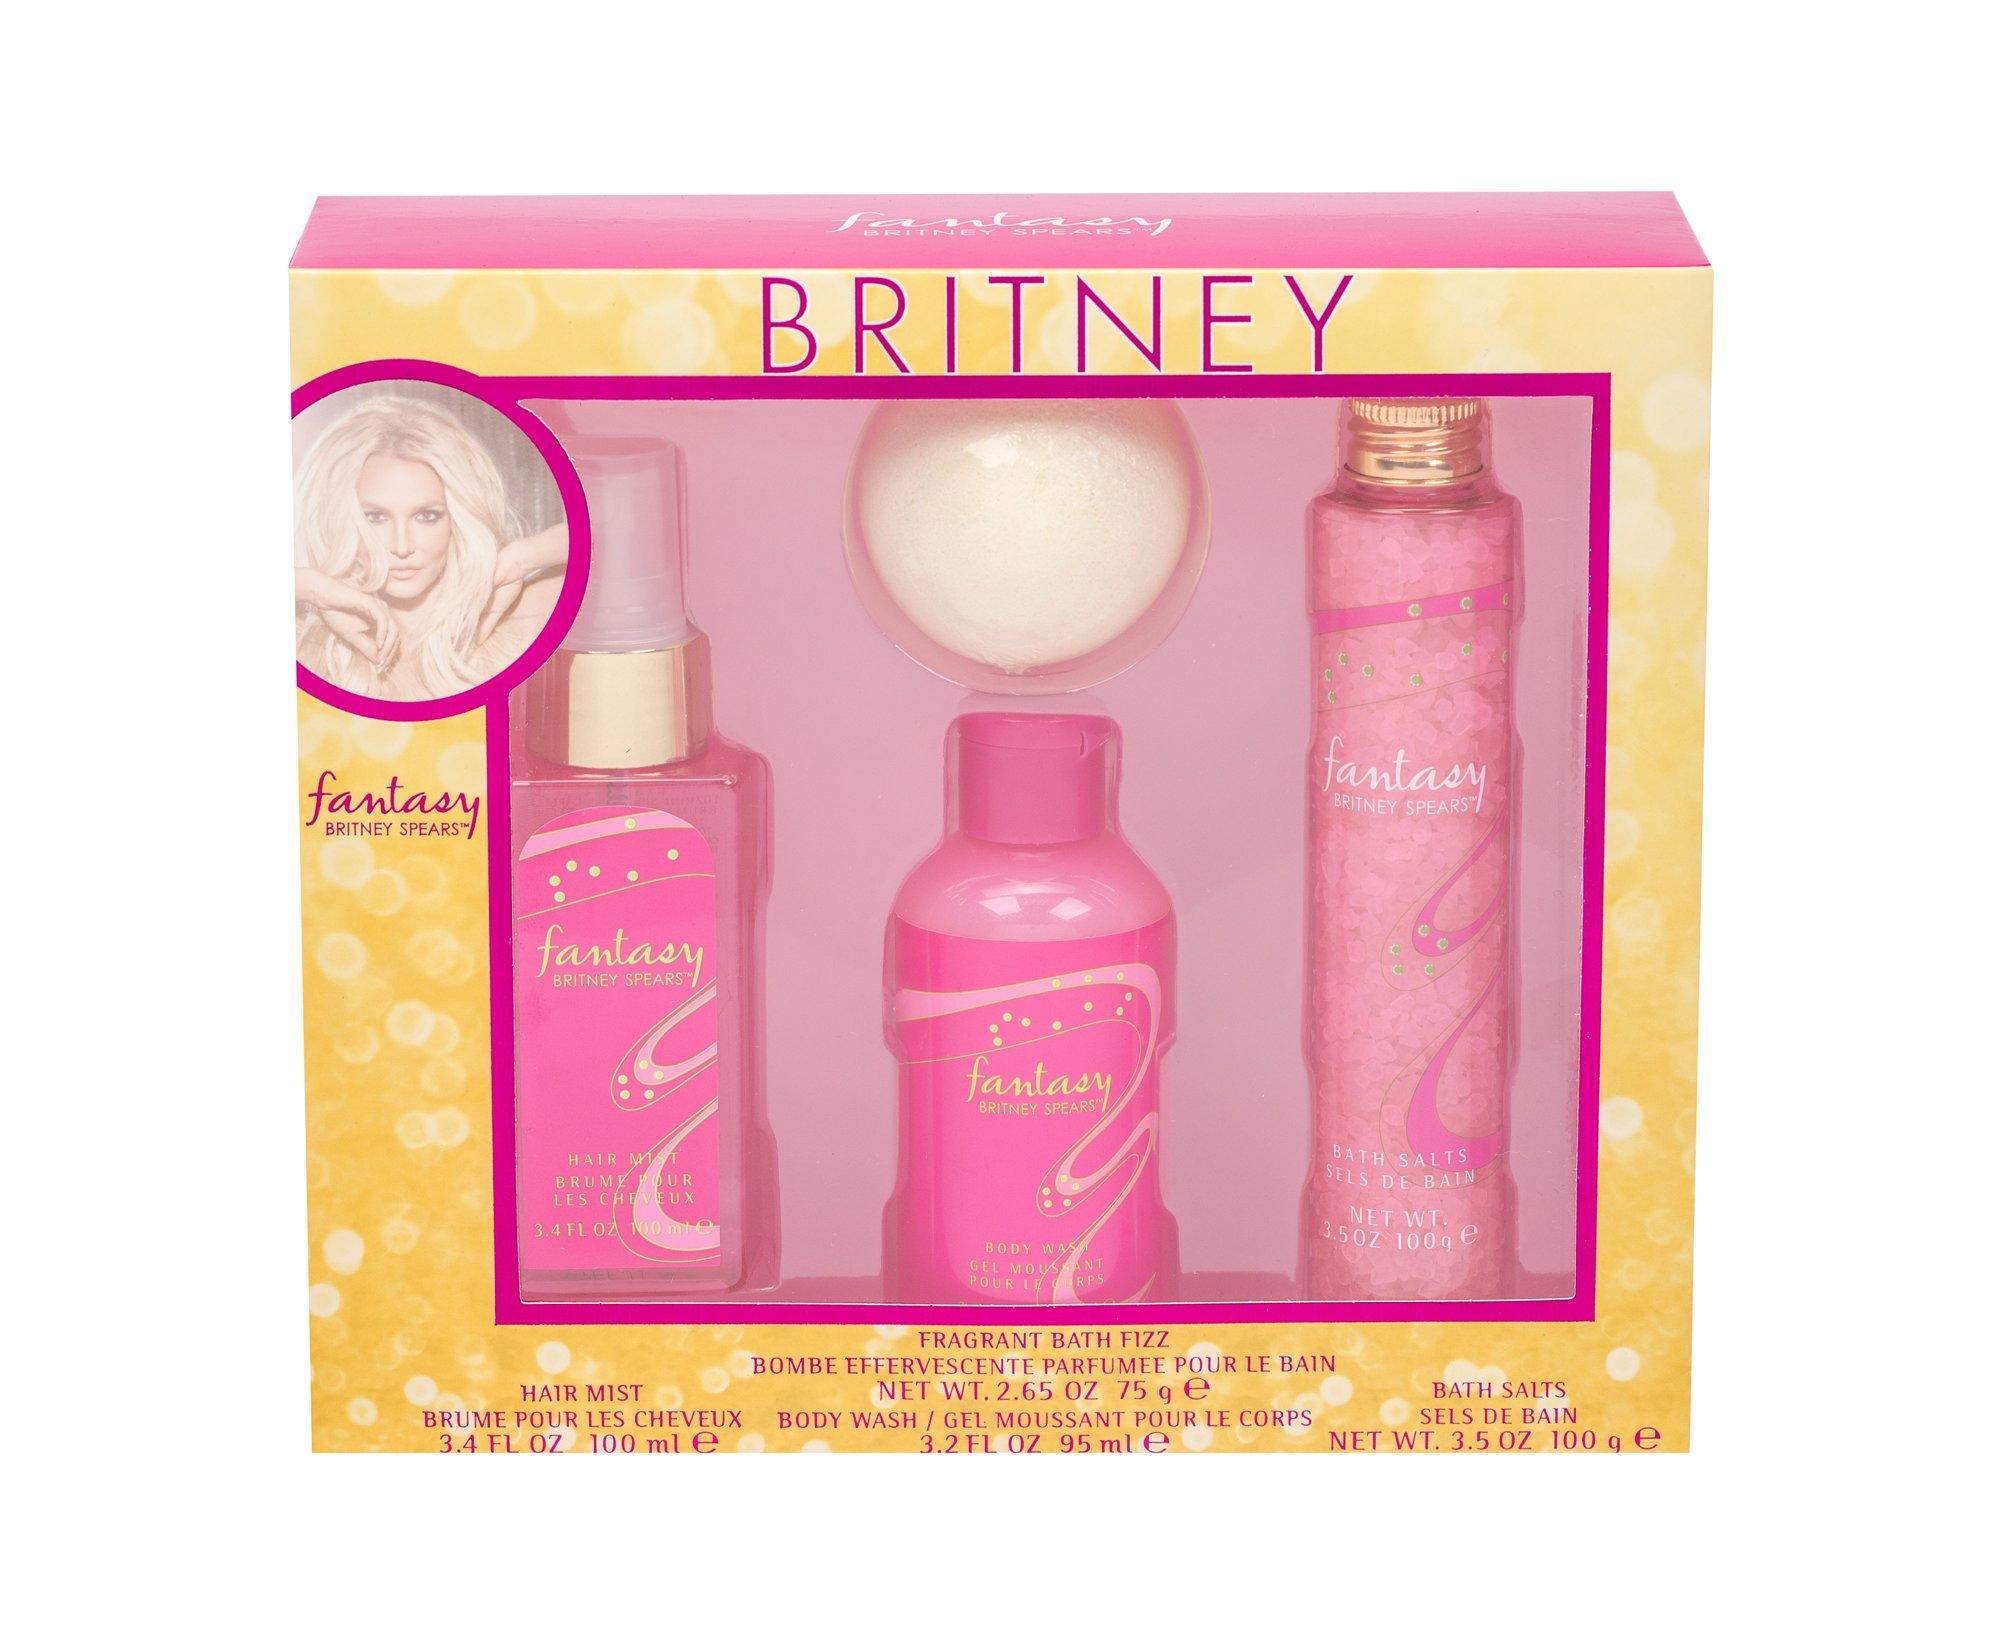 Britney Spears Fantasy Hair Mist 100ml